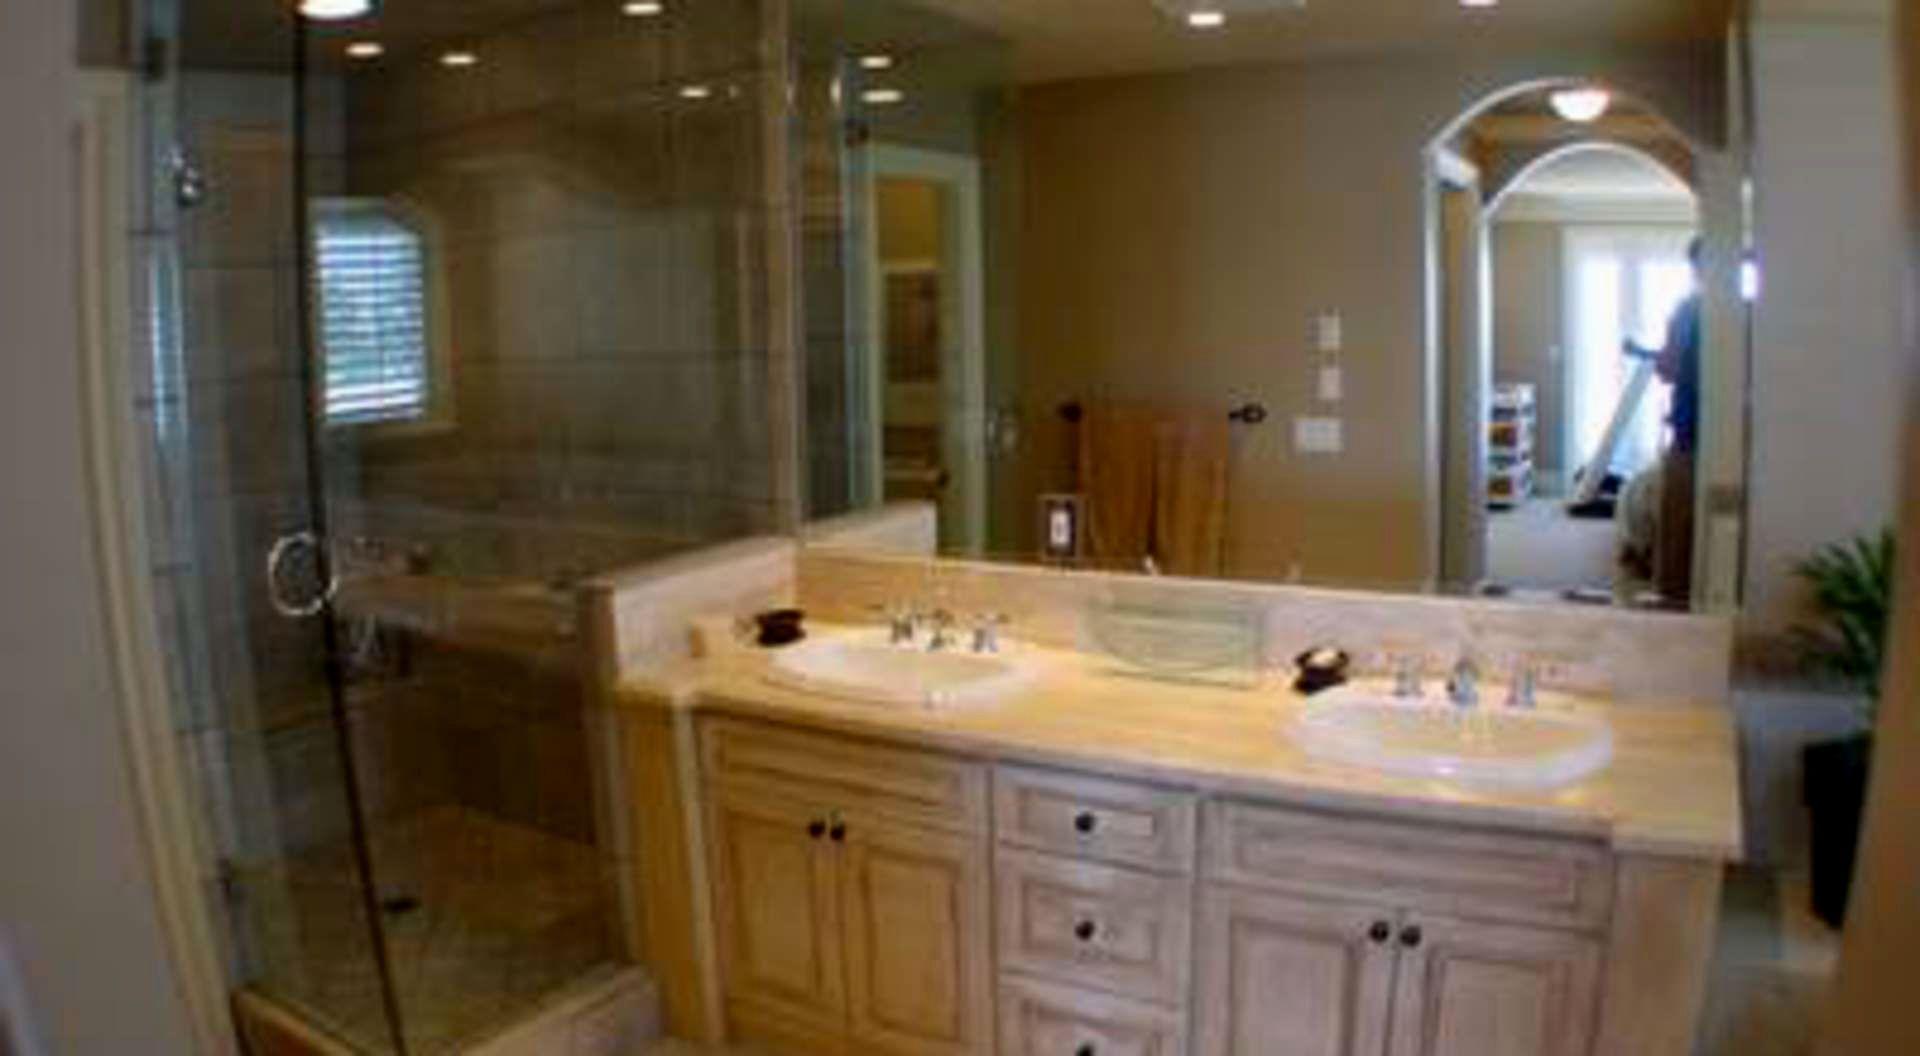 sensational polo bathroom sets photo-Amazing Polo Bathroom Sets Decoration